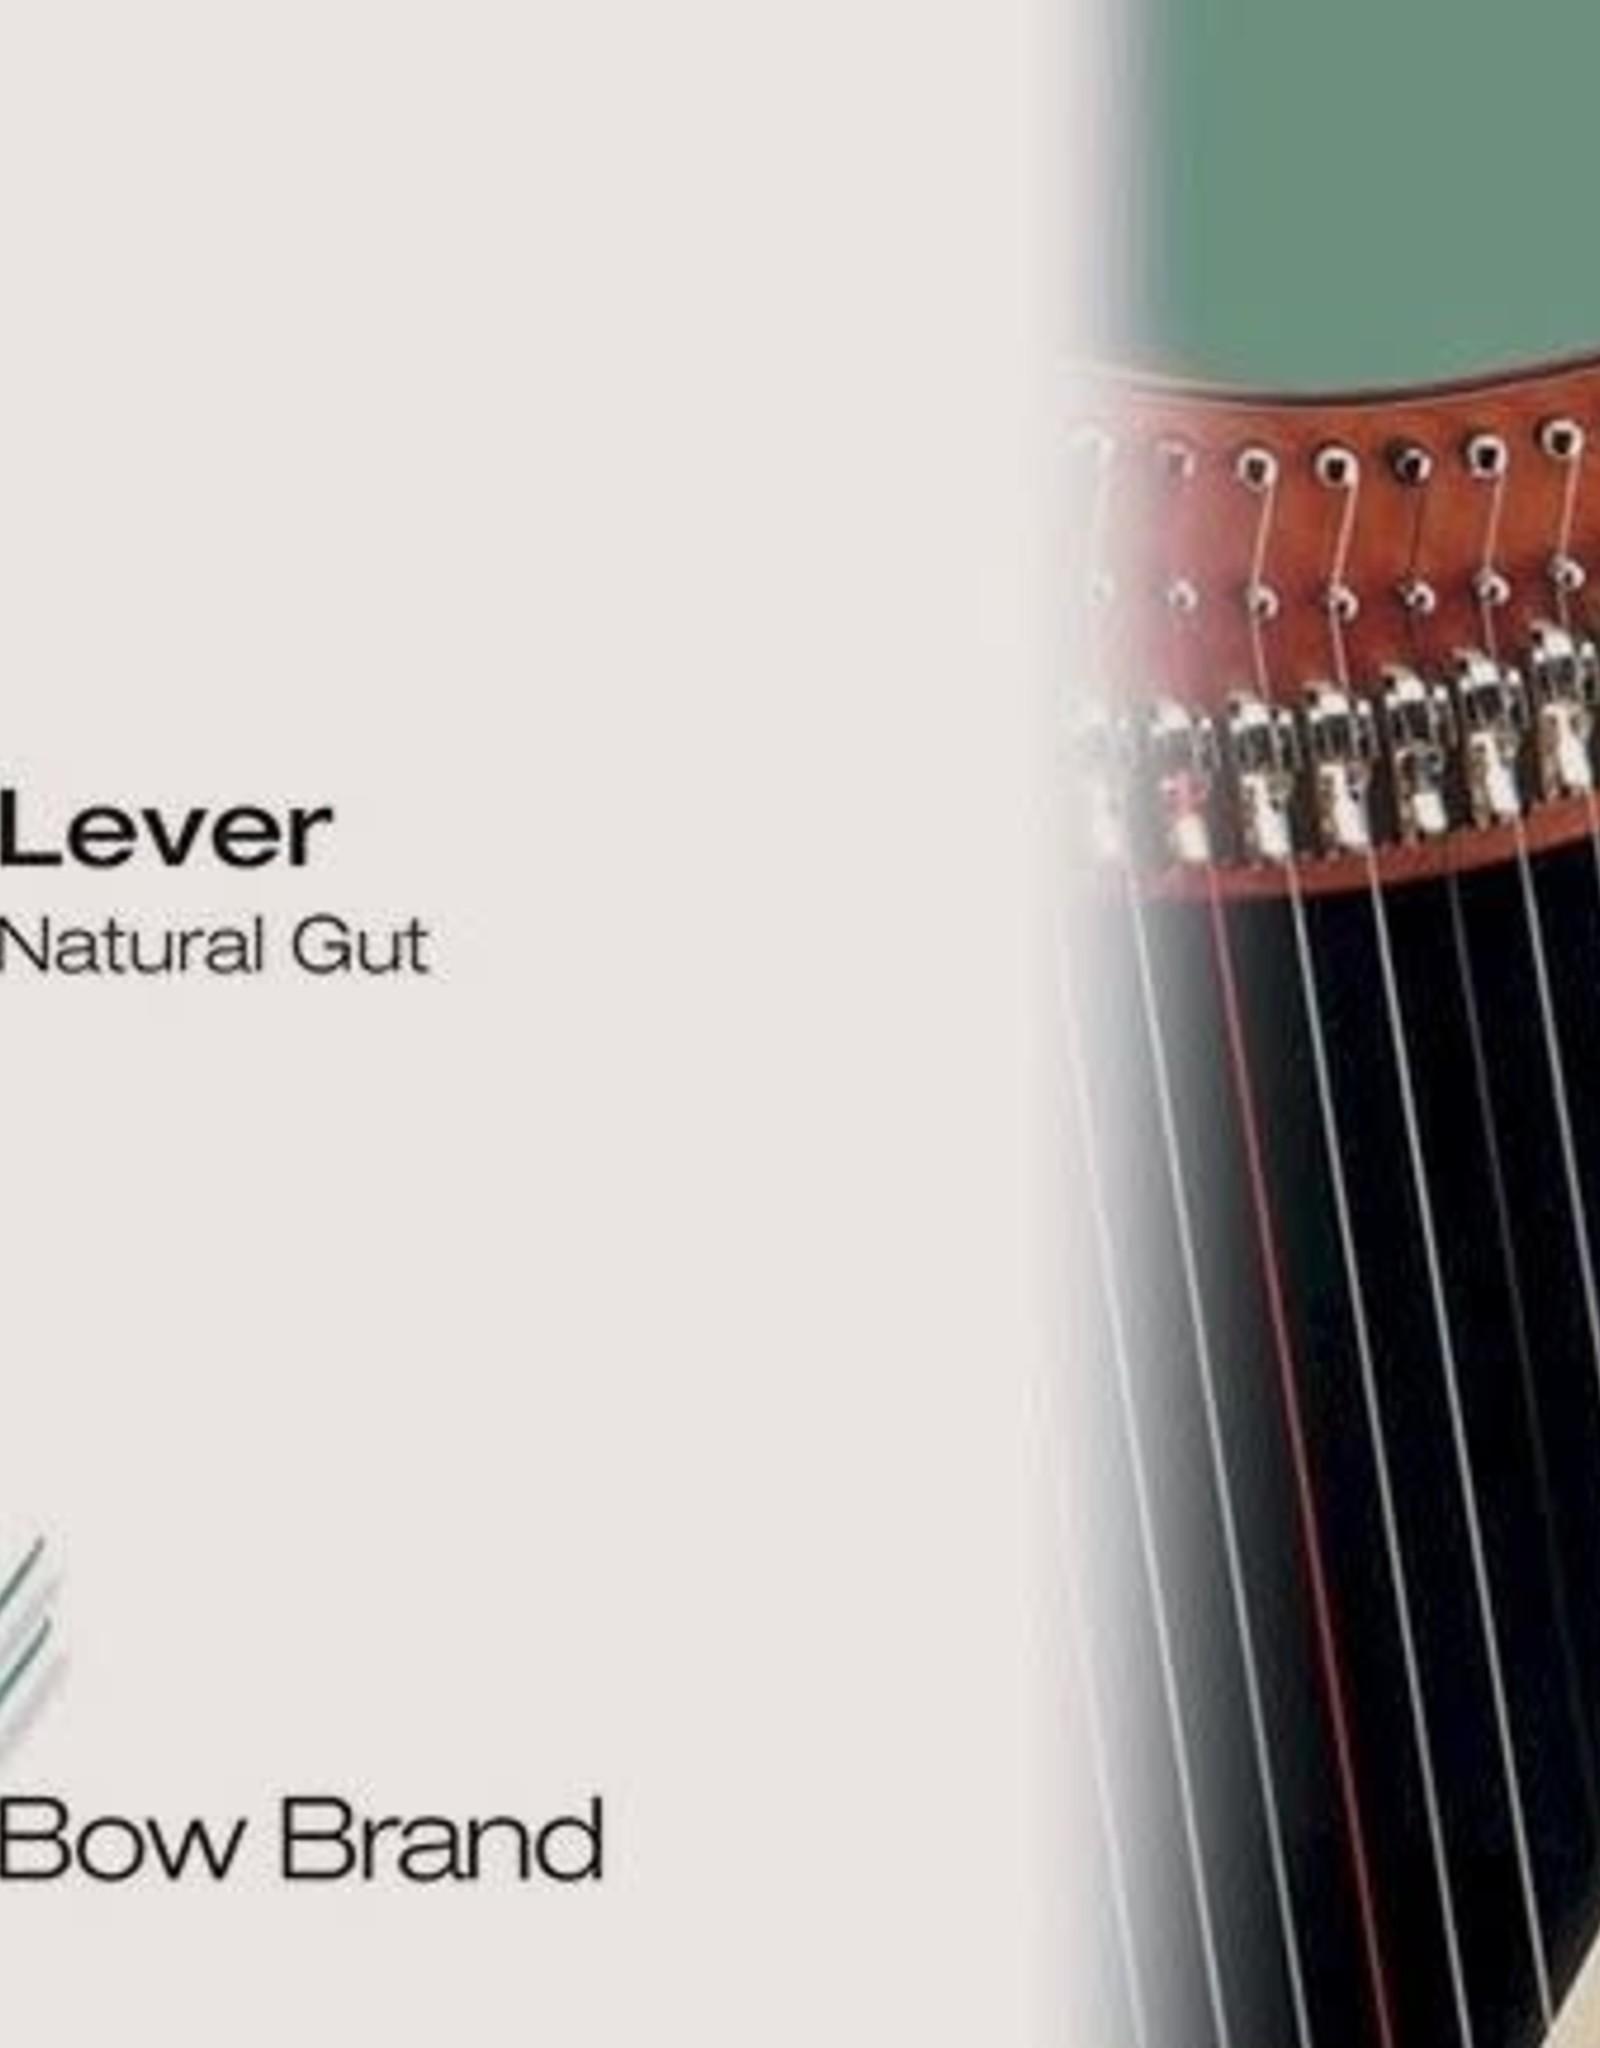 BOW BRAND  klep darm - lever GUT 28/4 fa